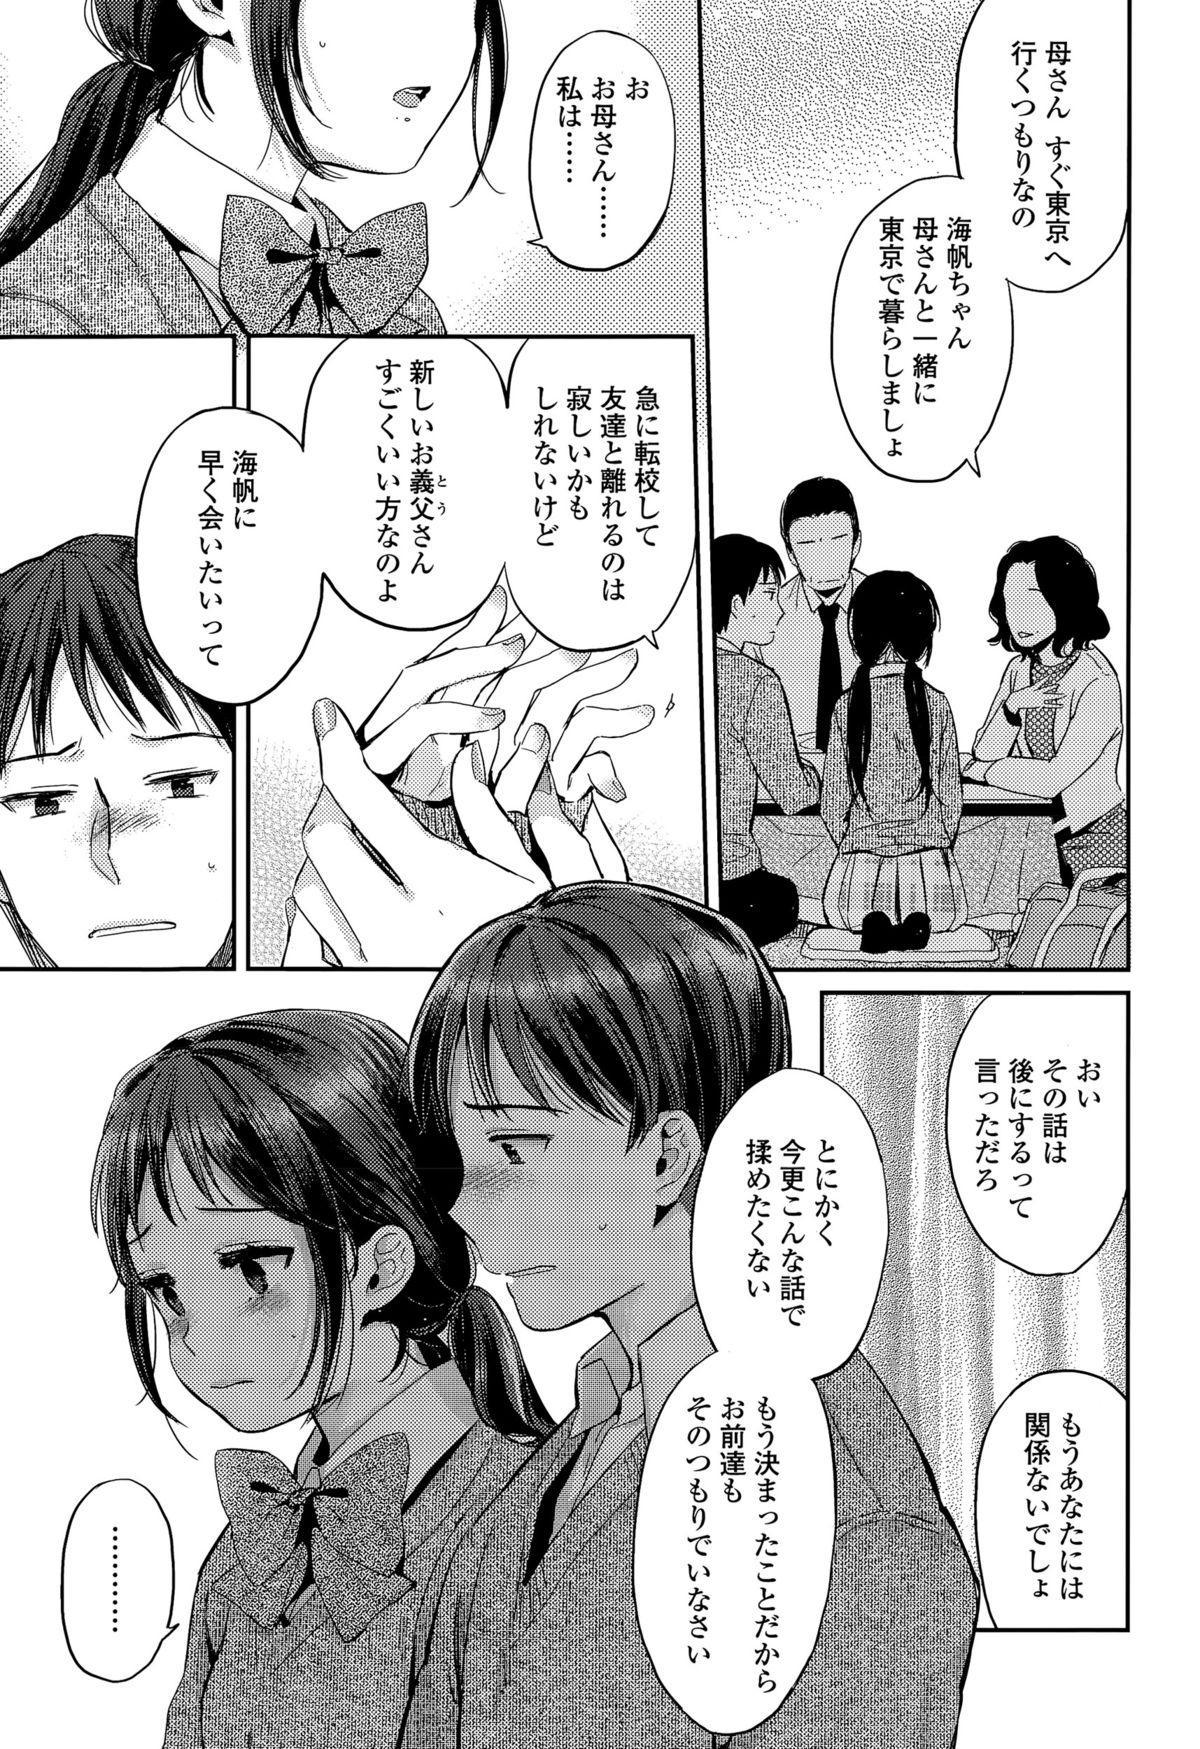 COMIC Koh Vol. 6 422